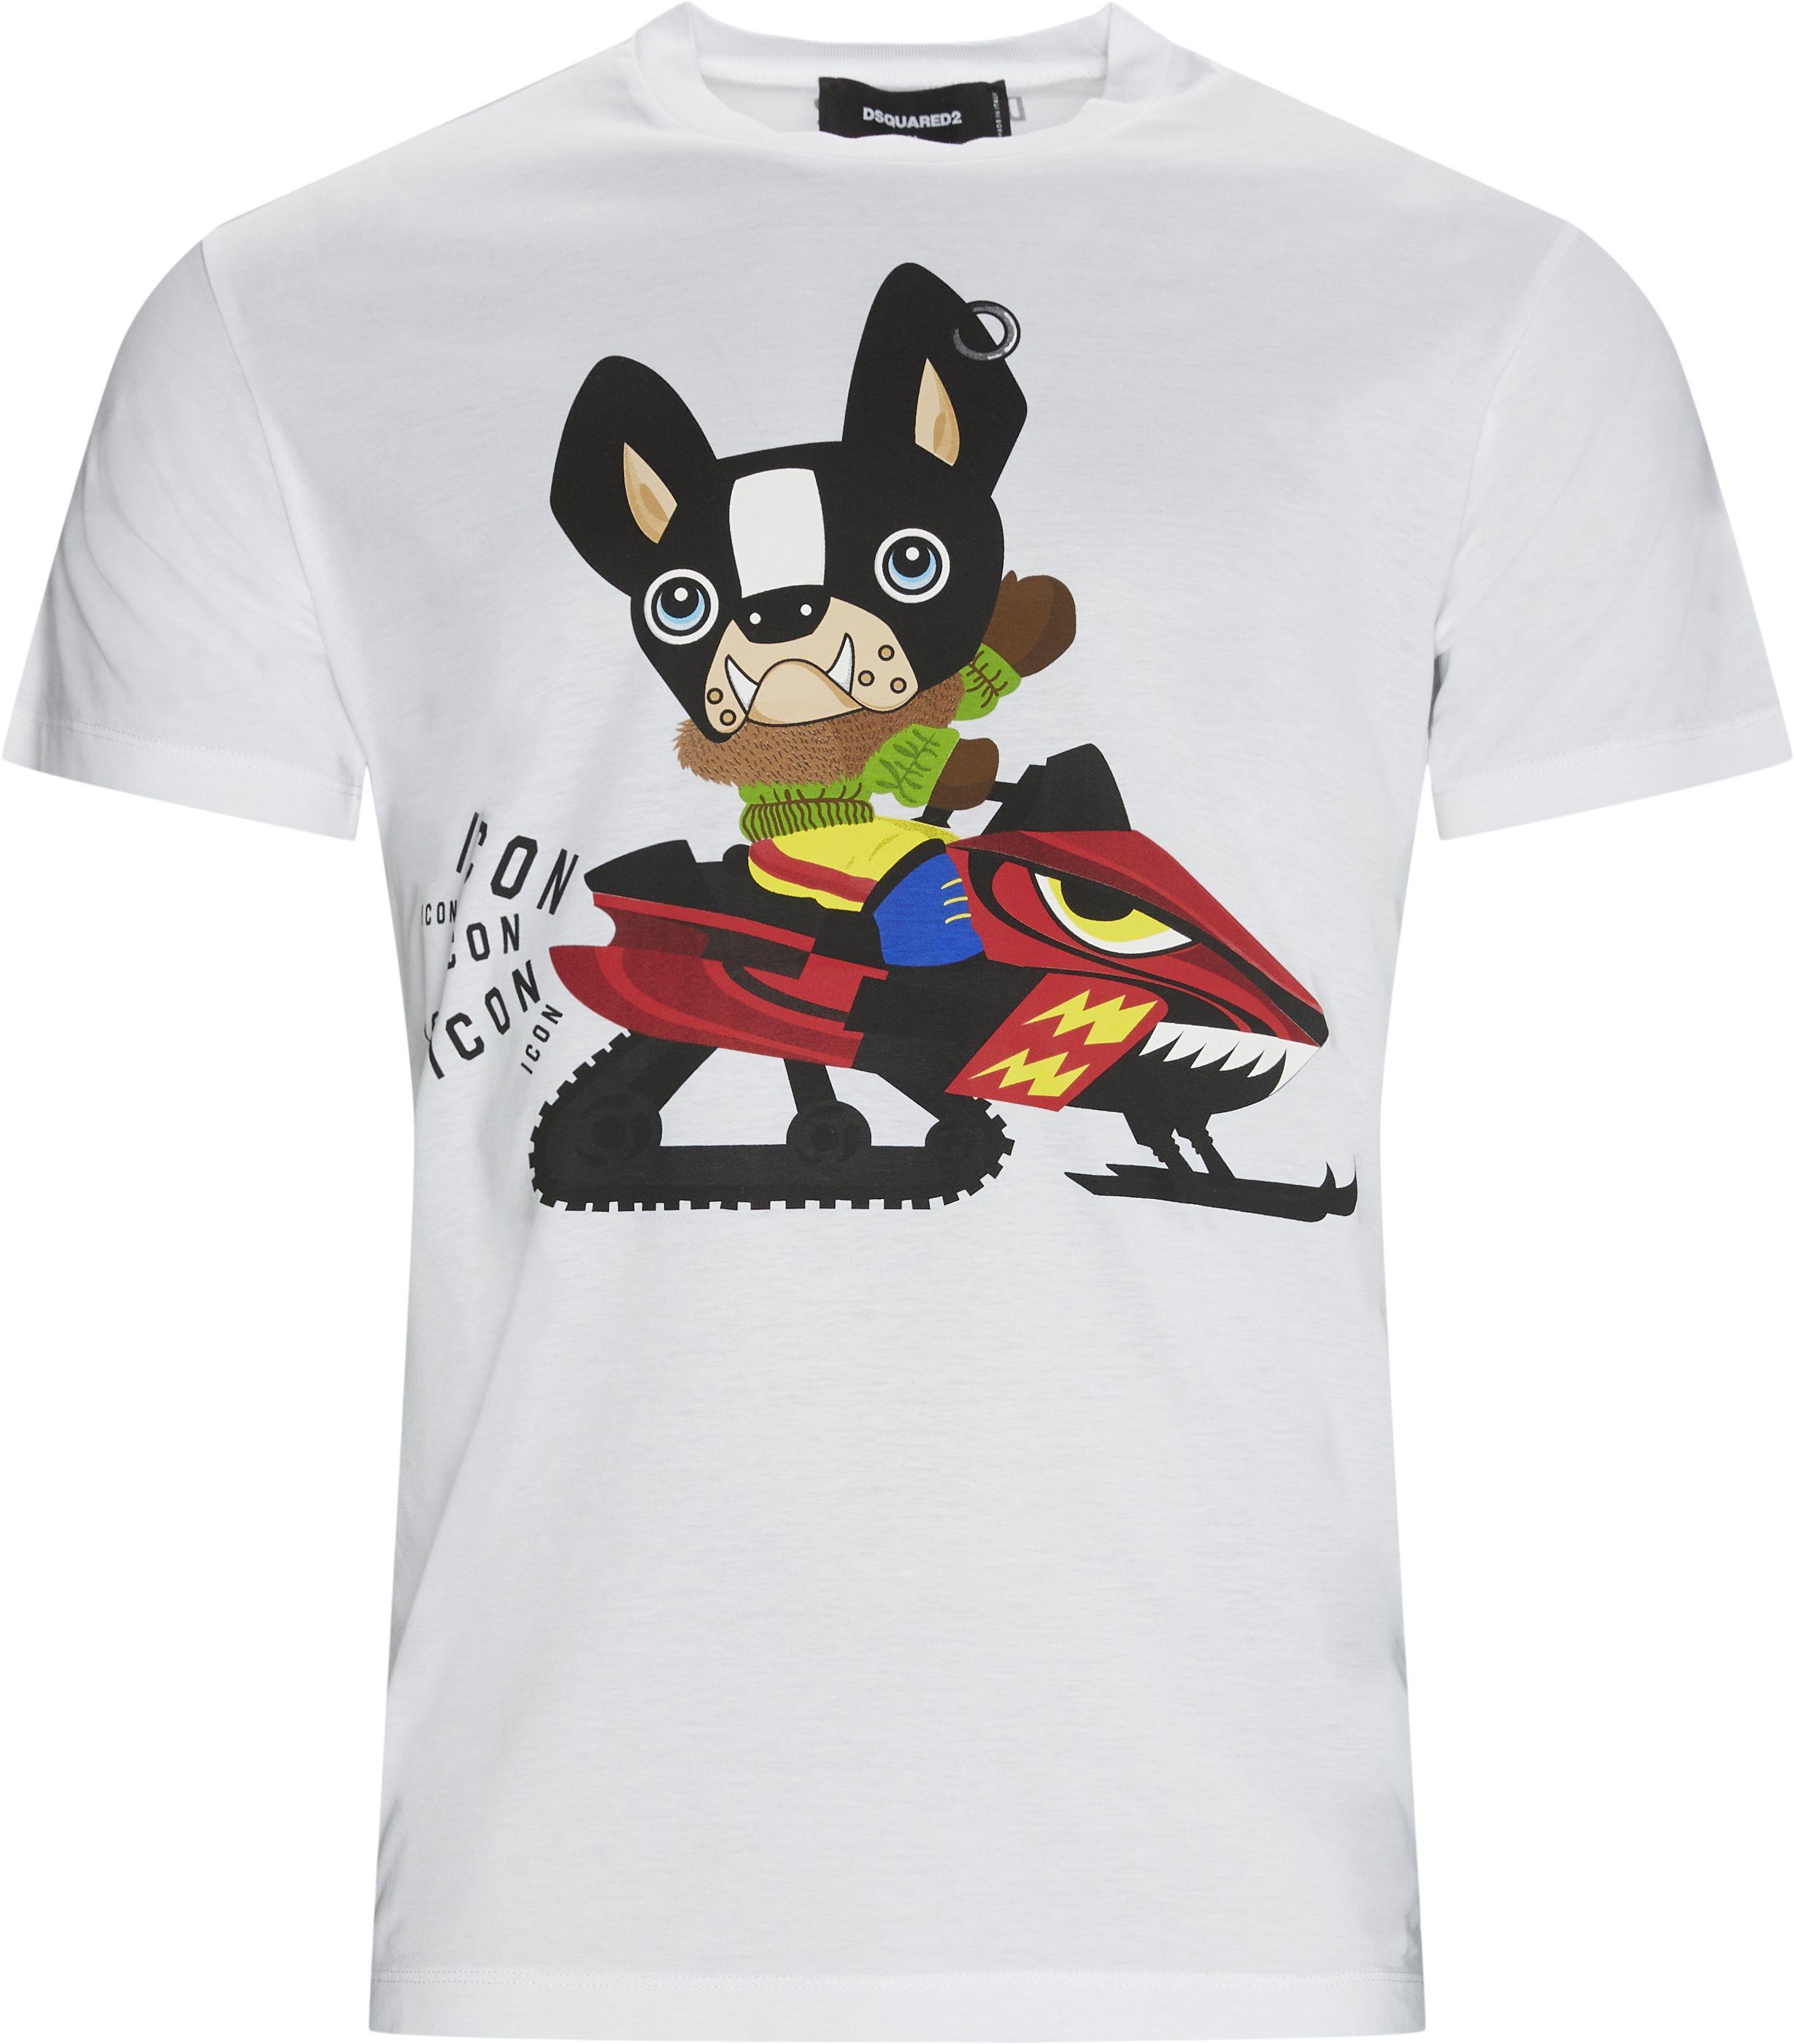 Print Tee - T-shirts - Regular fit - Hvid